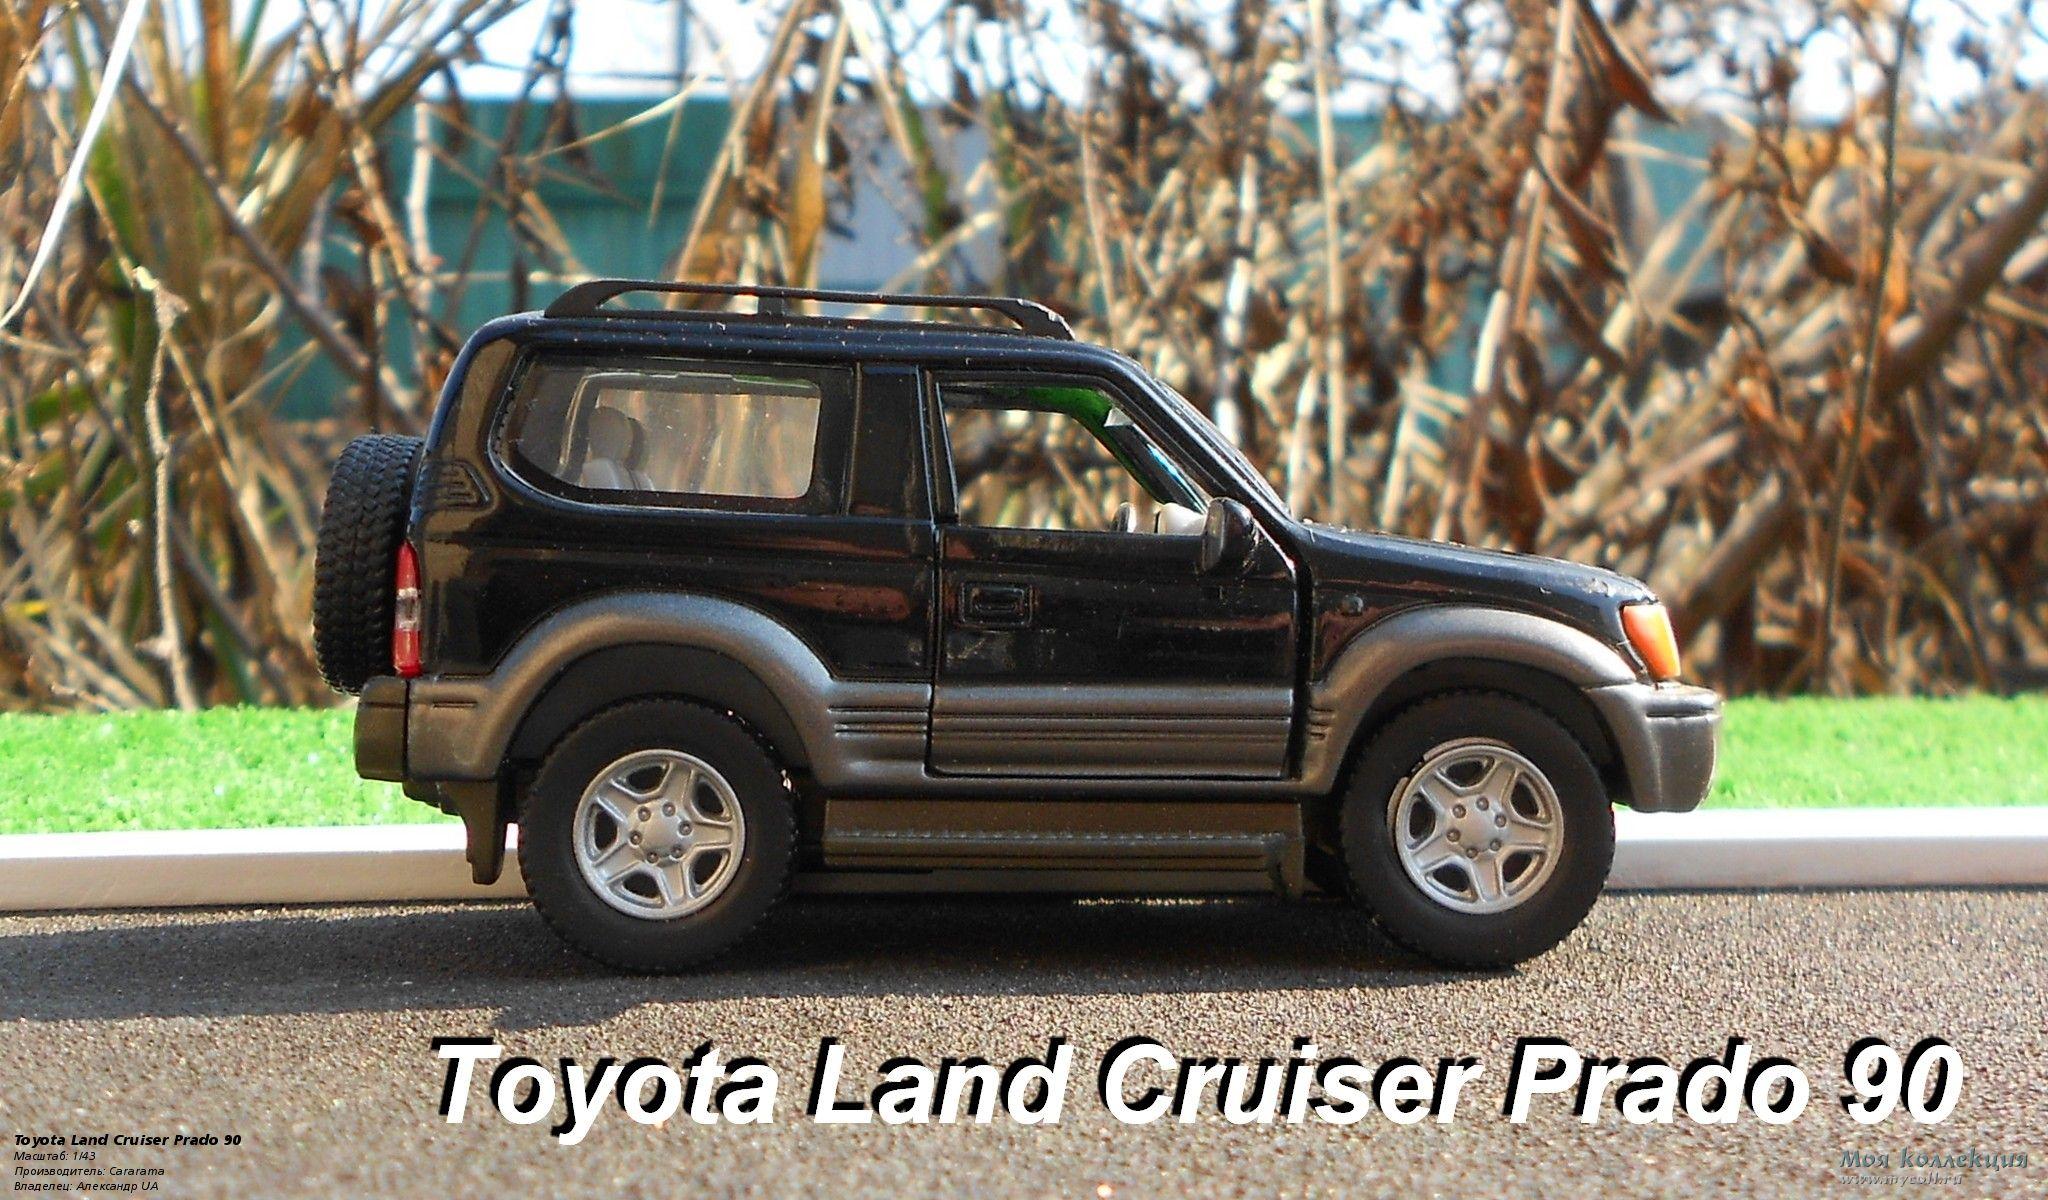 TOYOTA Land Cruiser / Prado models - autoevolution